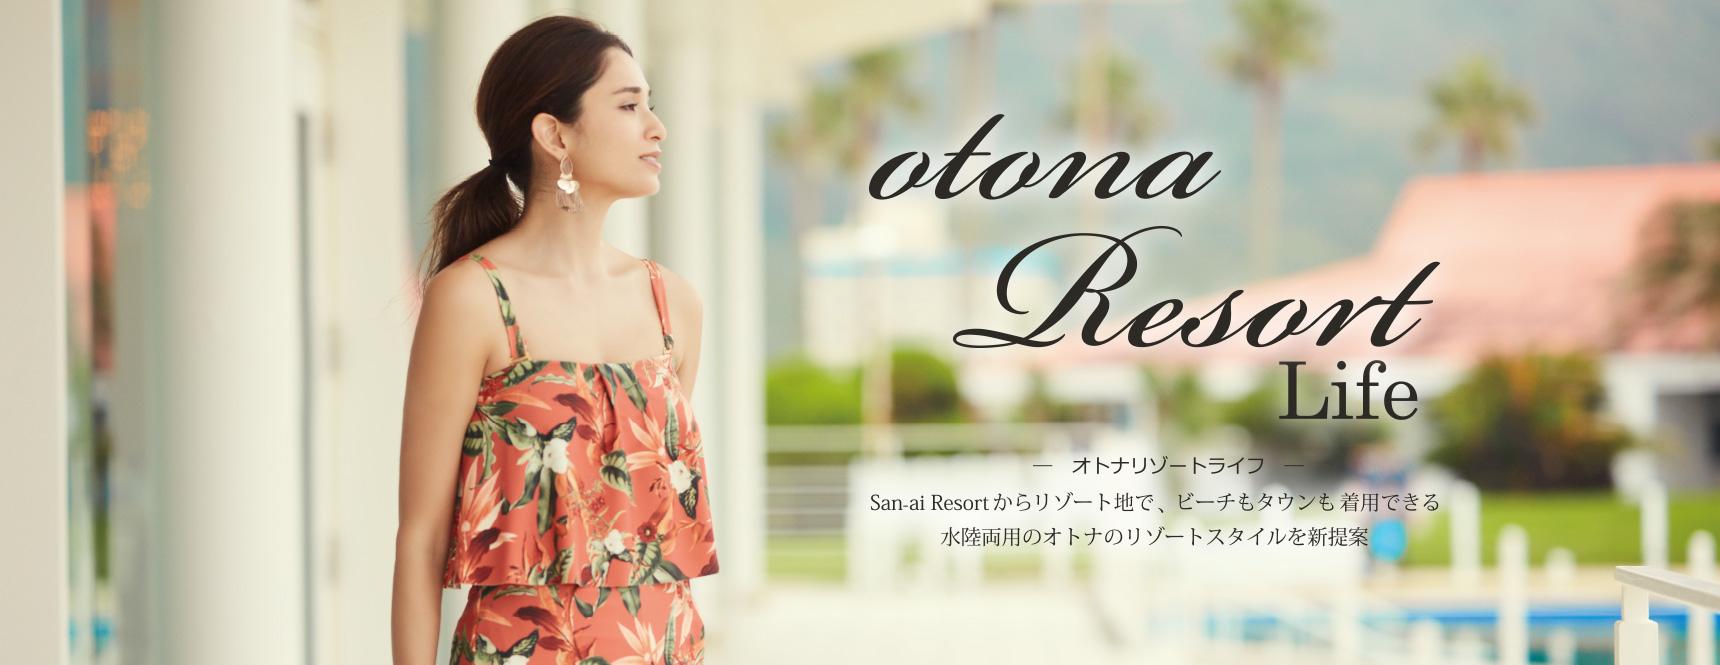 otona Resort Life オトナリゾートライフ San-ai Resortからリゾート地で、ビーチもタウンも着用できる水陸両用のオトナのリゾートスタイルを新提案